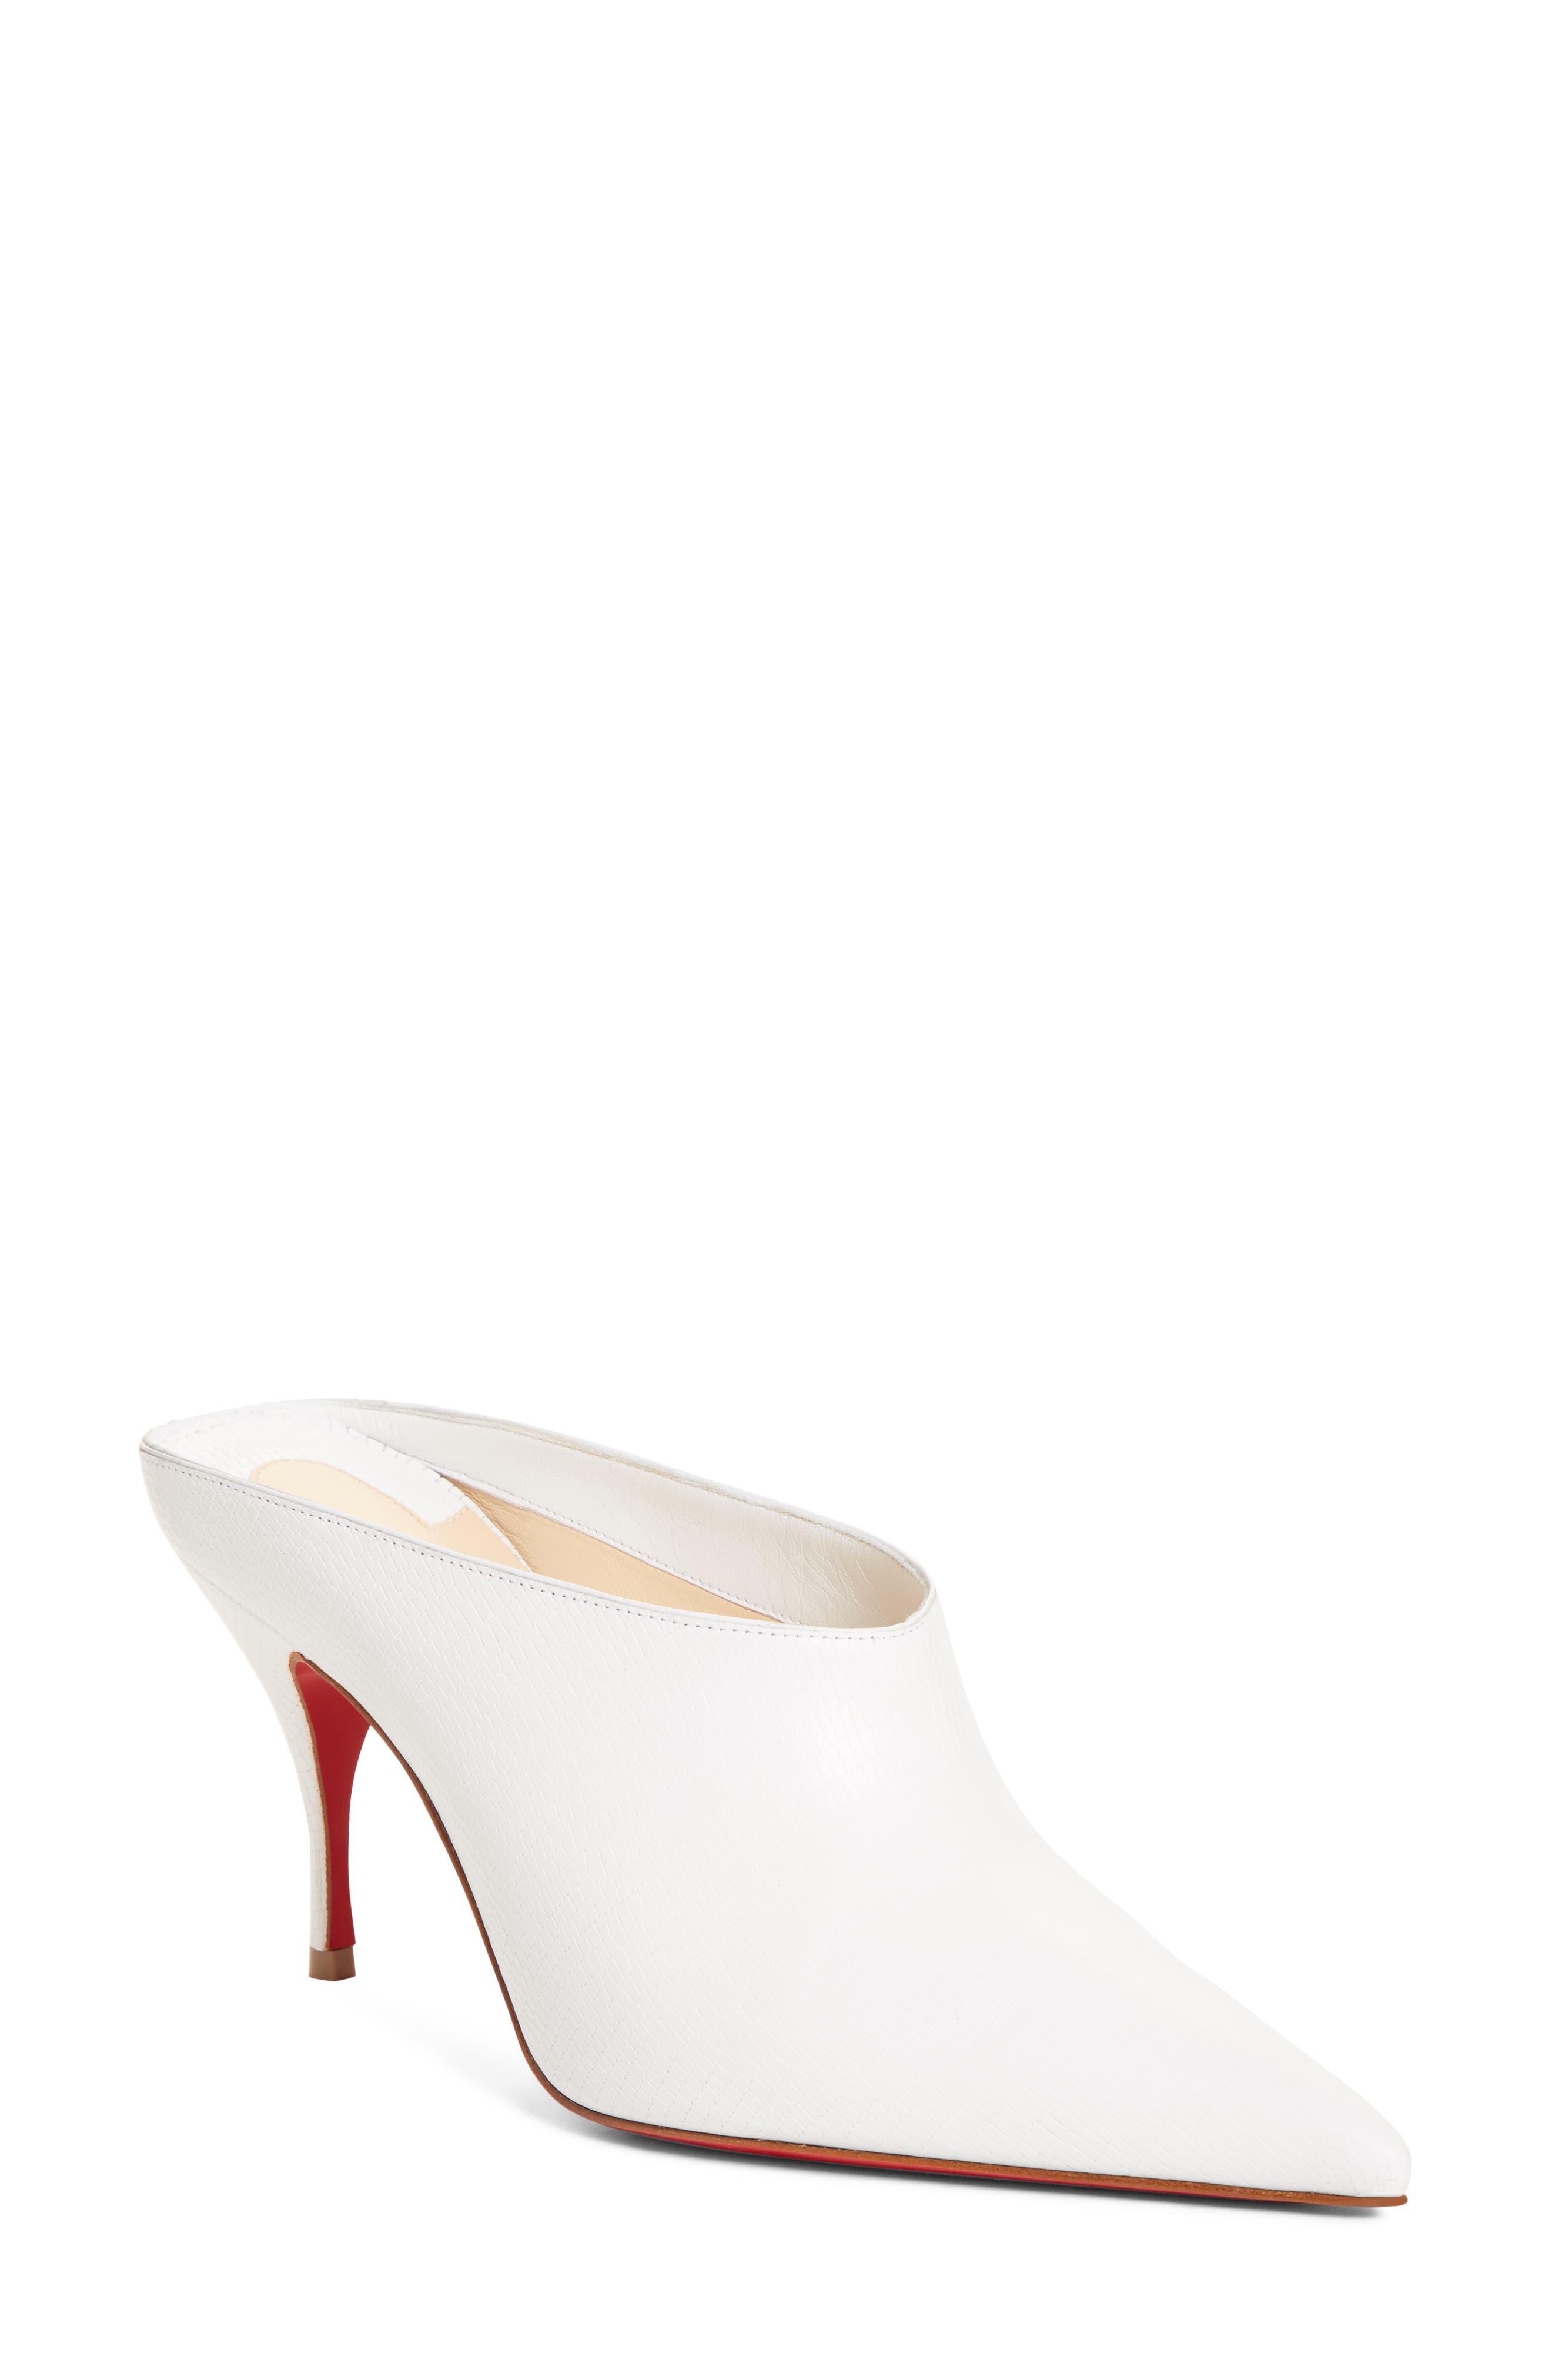 Christian Louboutin Quart Pointy Toe Mule - White